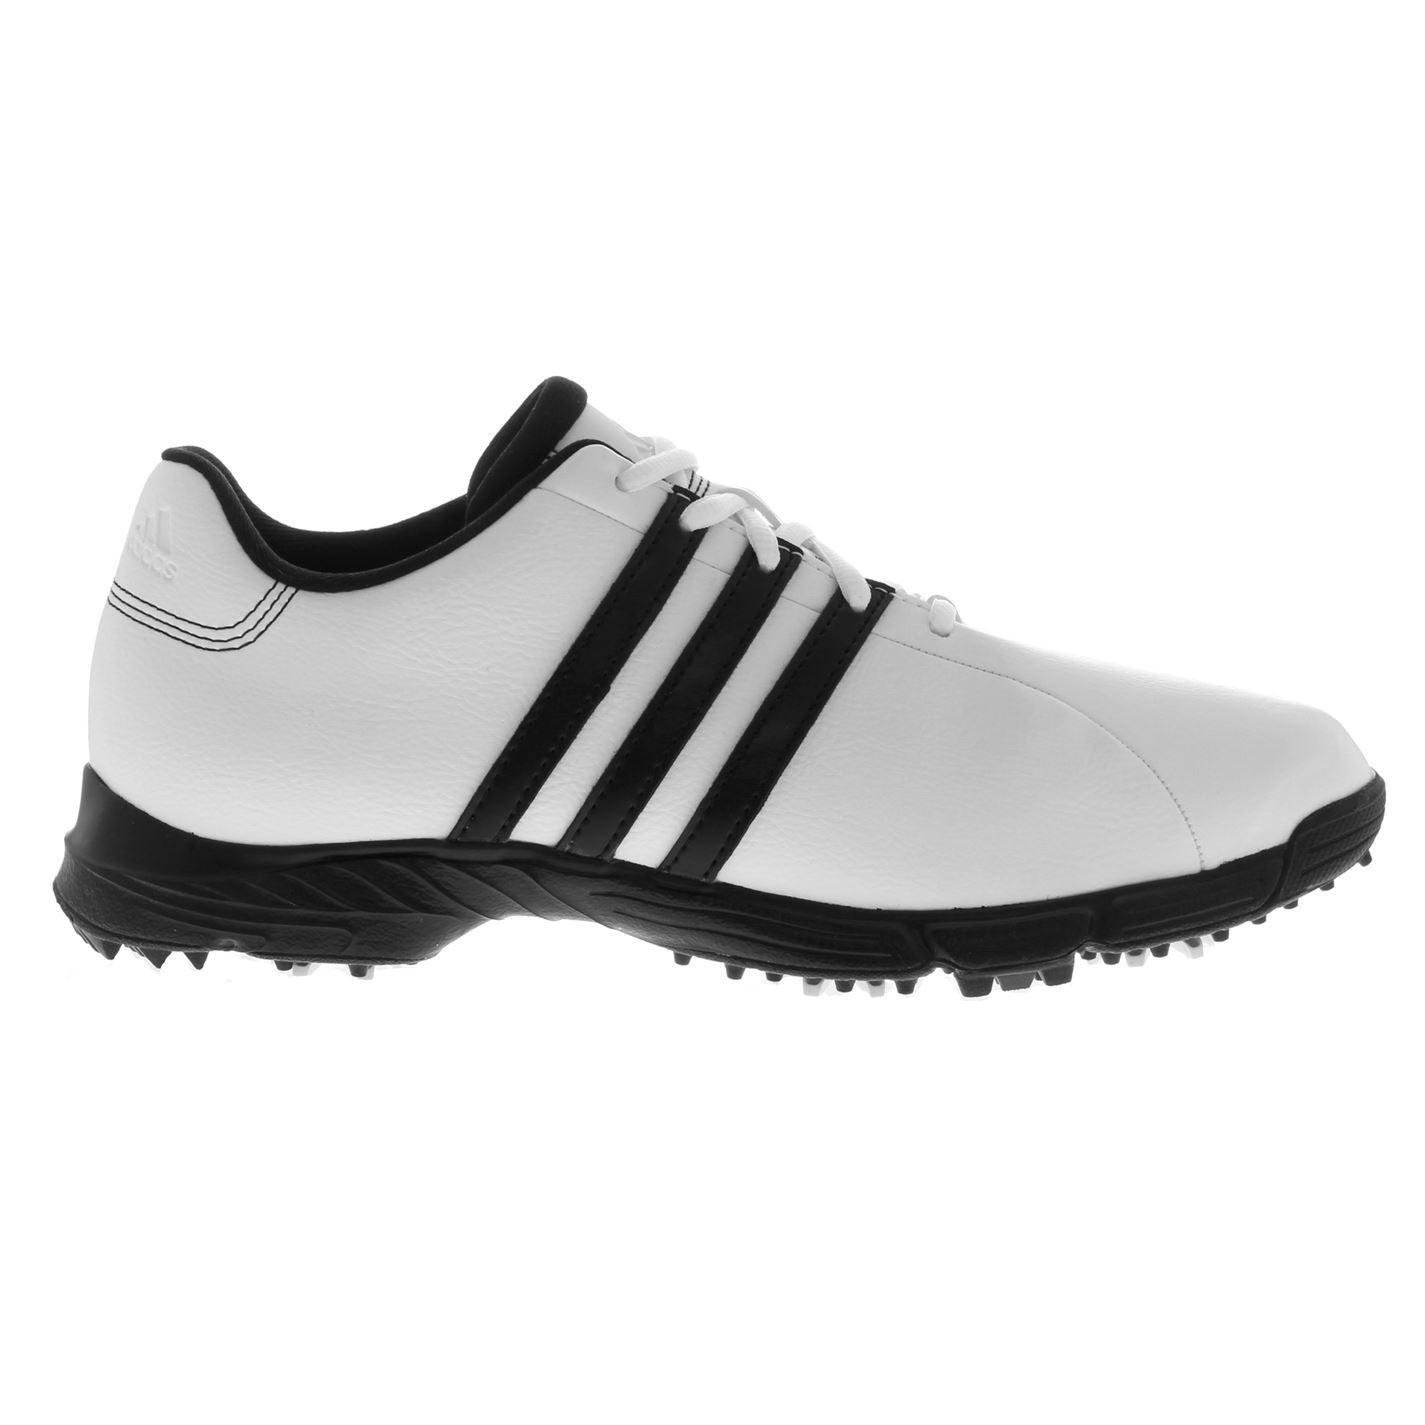 adidas-Golflite-Golf-Shoes-Mens-Spikes-Footwear thumbnail 22